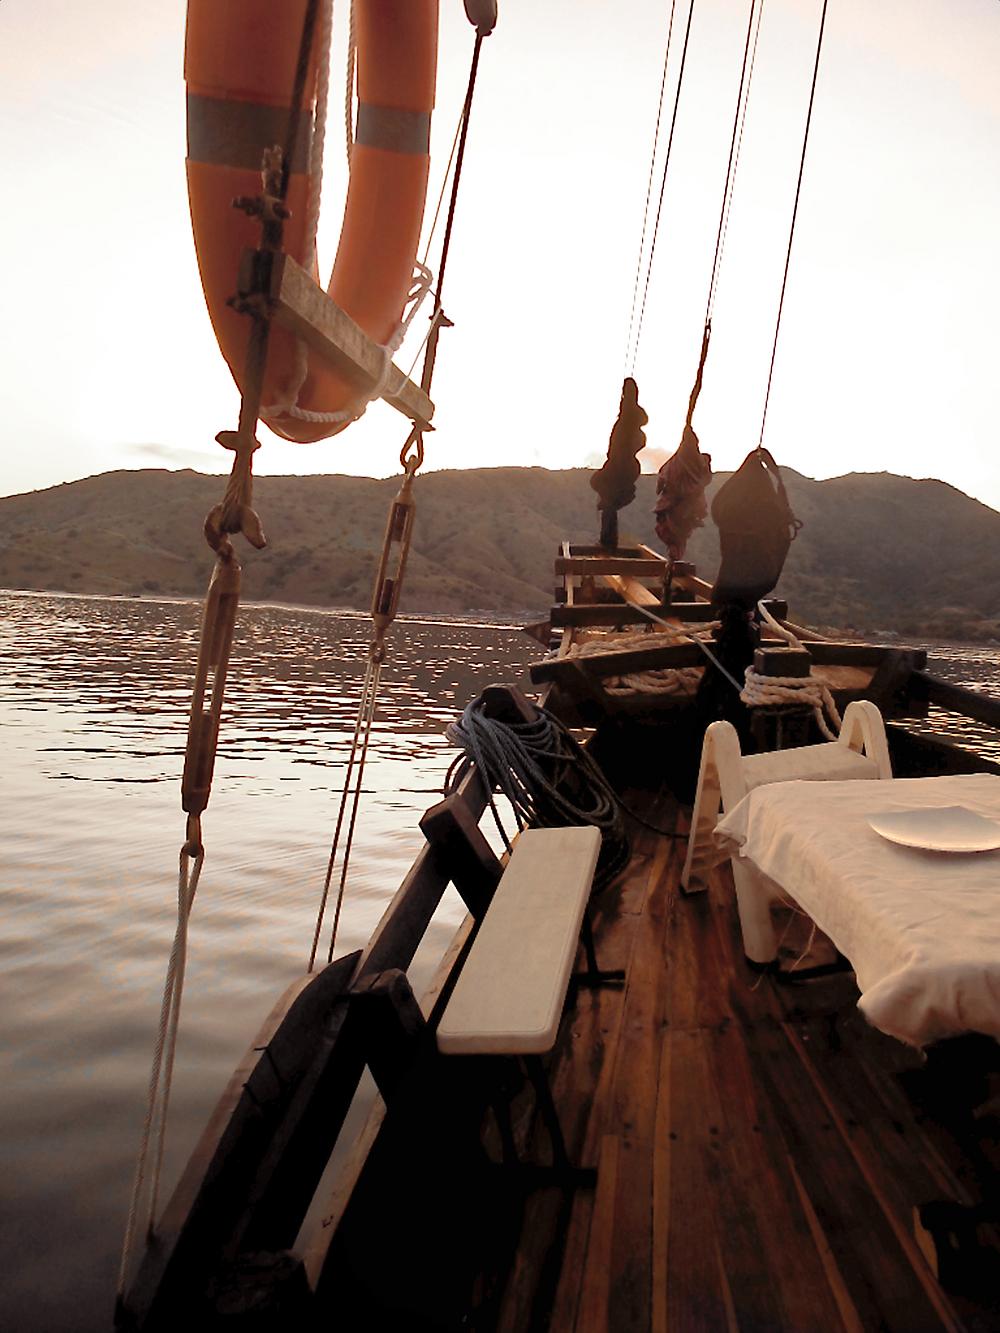 Laba laba boat, komodo liveaboard tour, komodo tour, komodo island tour, boat tour to komodo, boat trip to komodo, how to get to komodo island. labalaba boat, laba laba boat tour